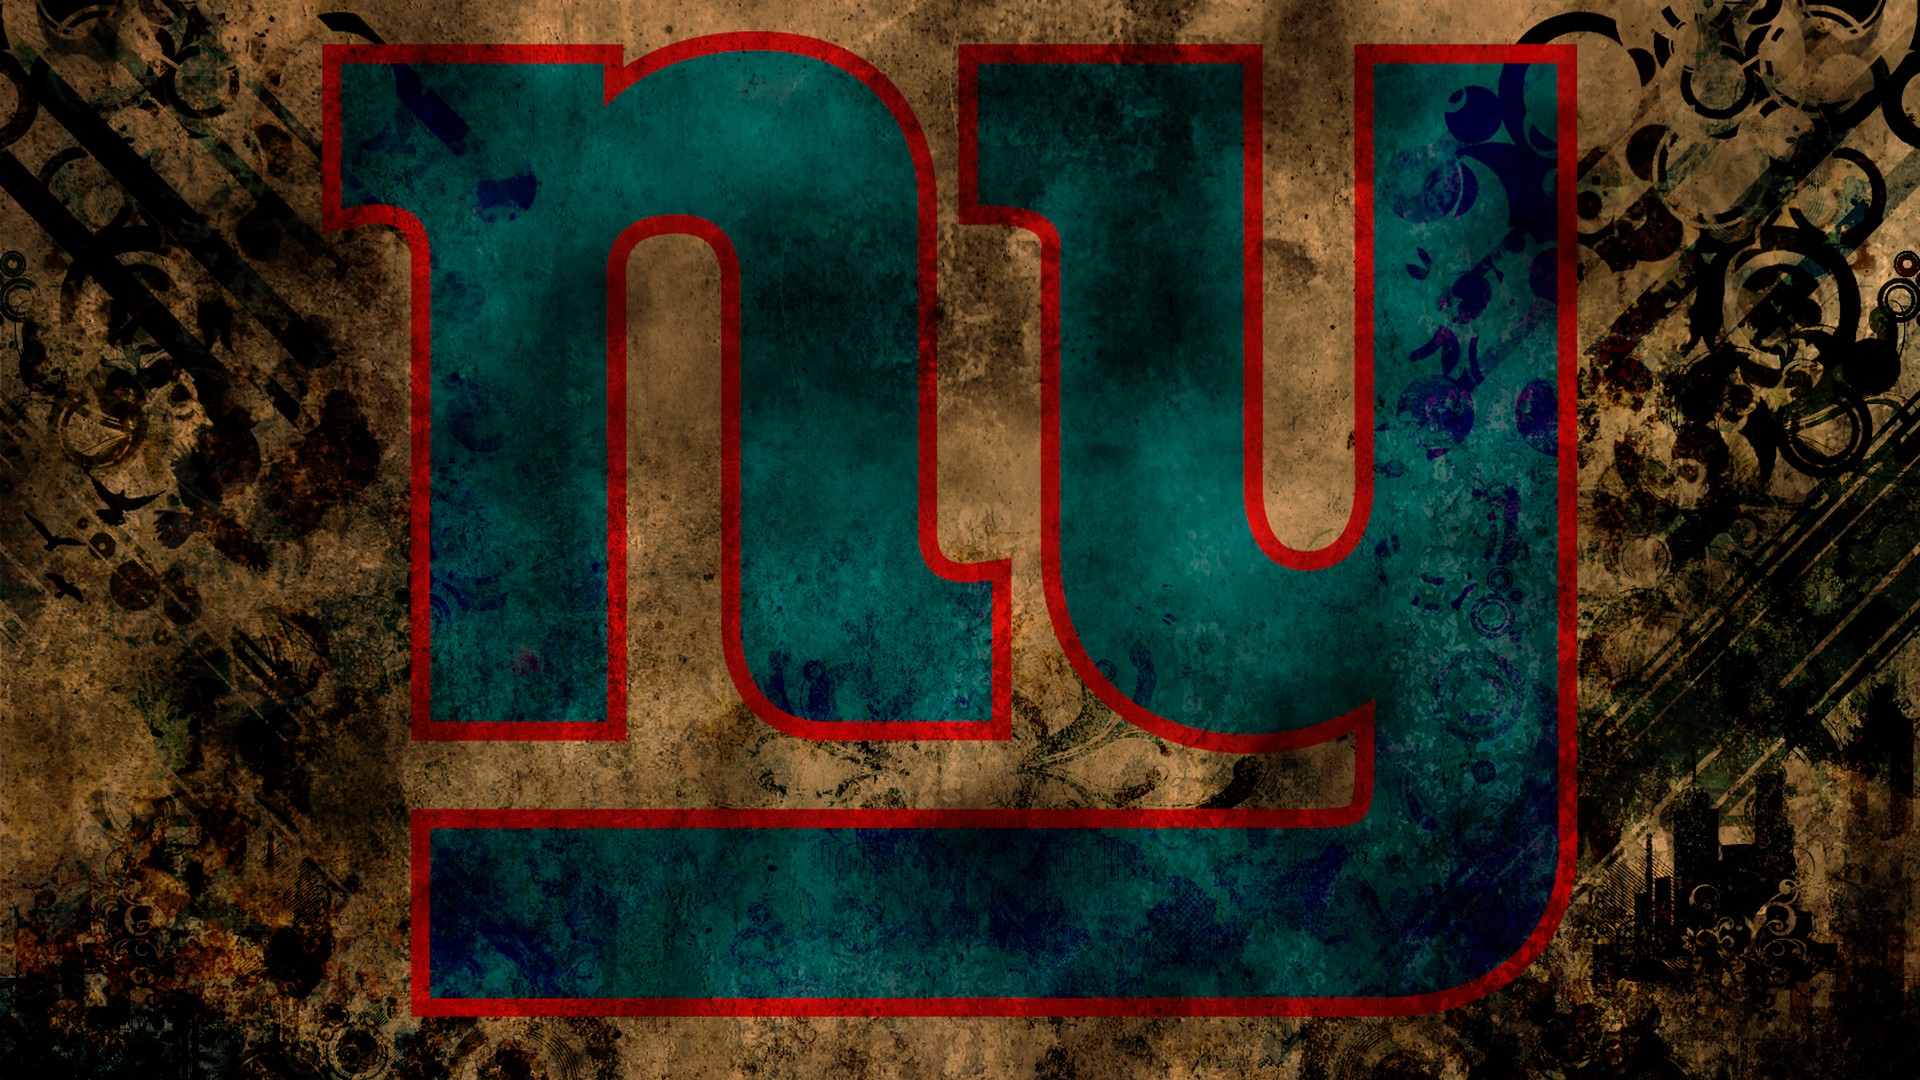 Windows Wallpaper New York Giants With High-resolution - HD Wallpaper